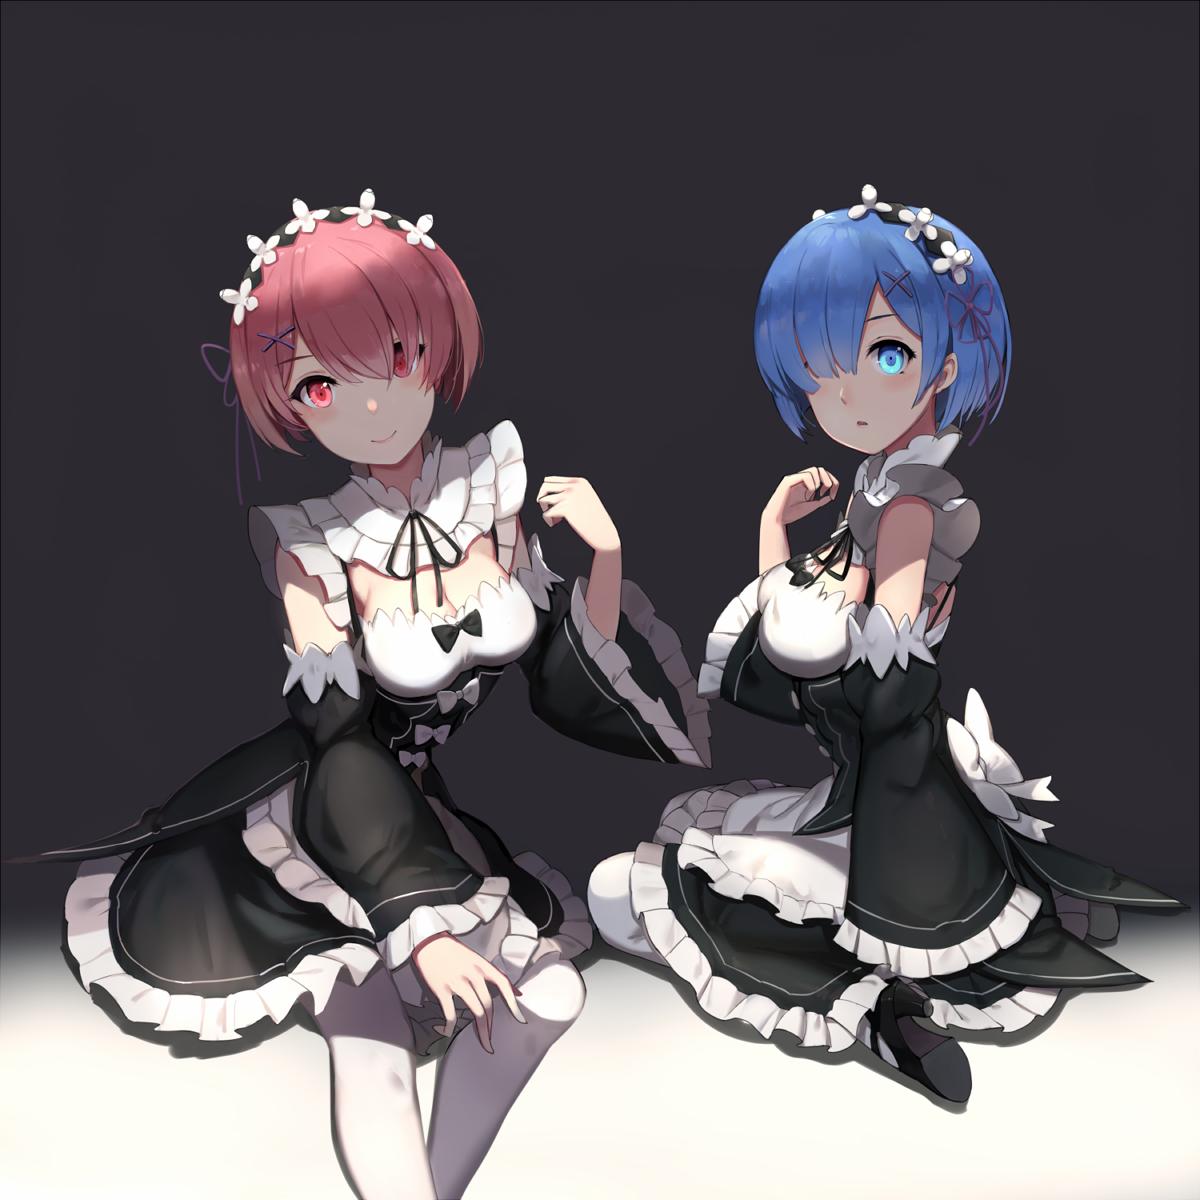 Rem u ram rezero kara hajimeru isekai seikatsu ram and rem